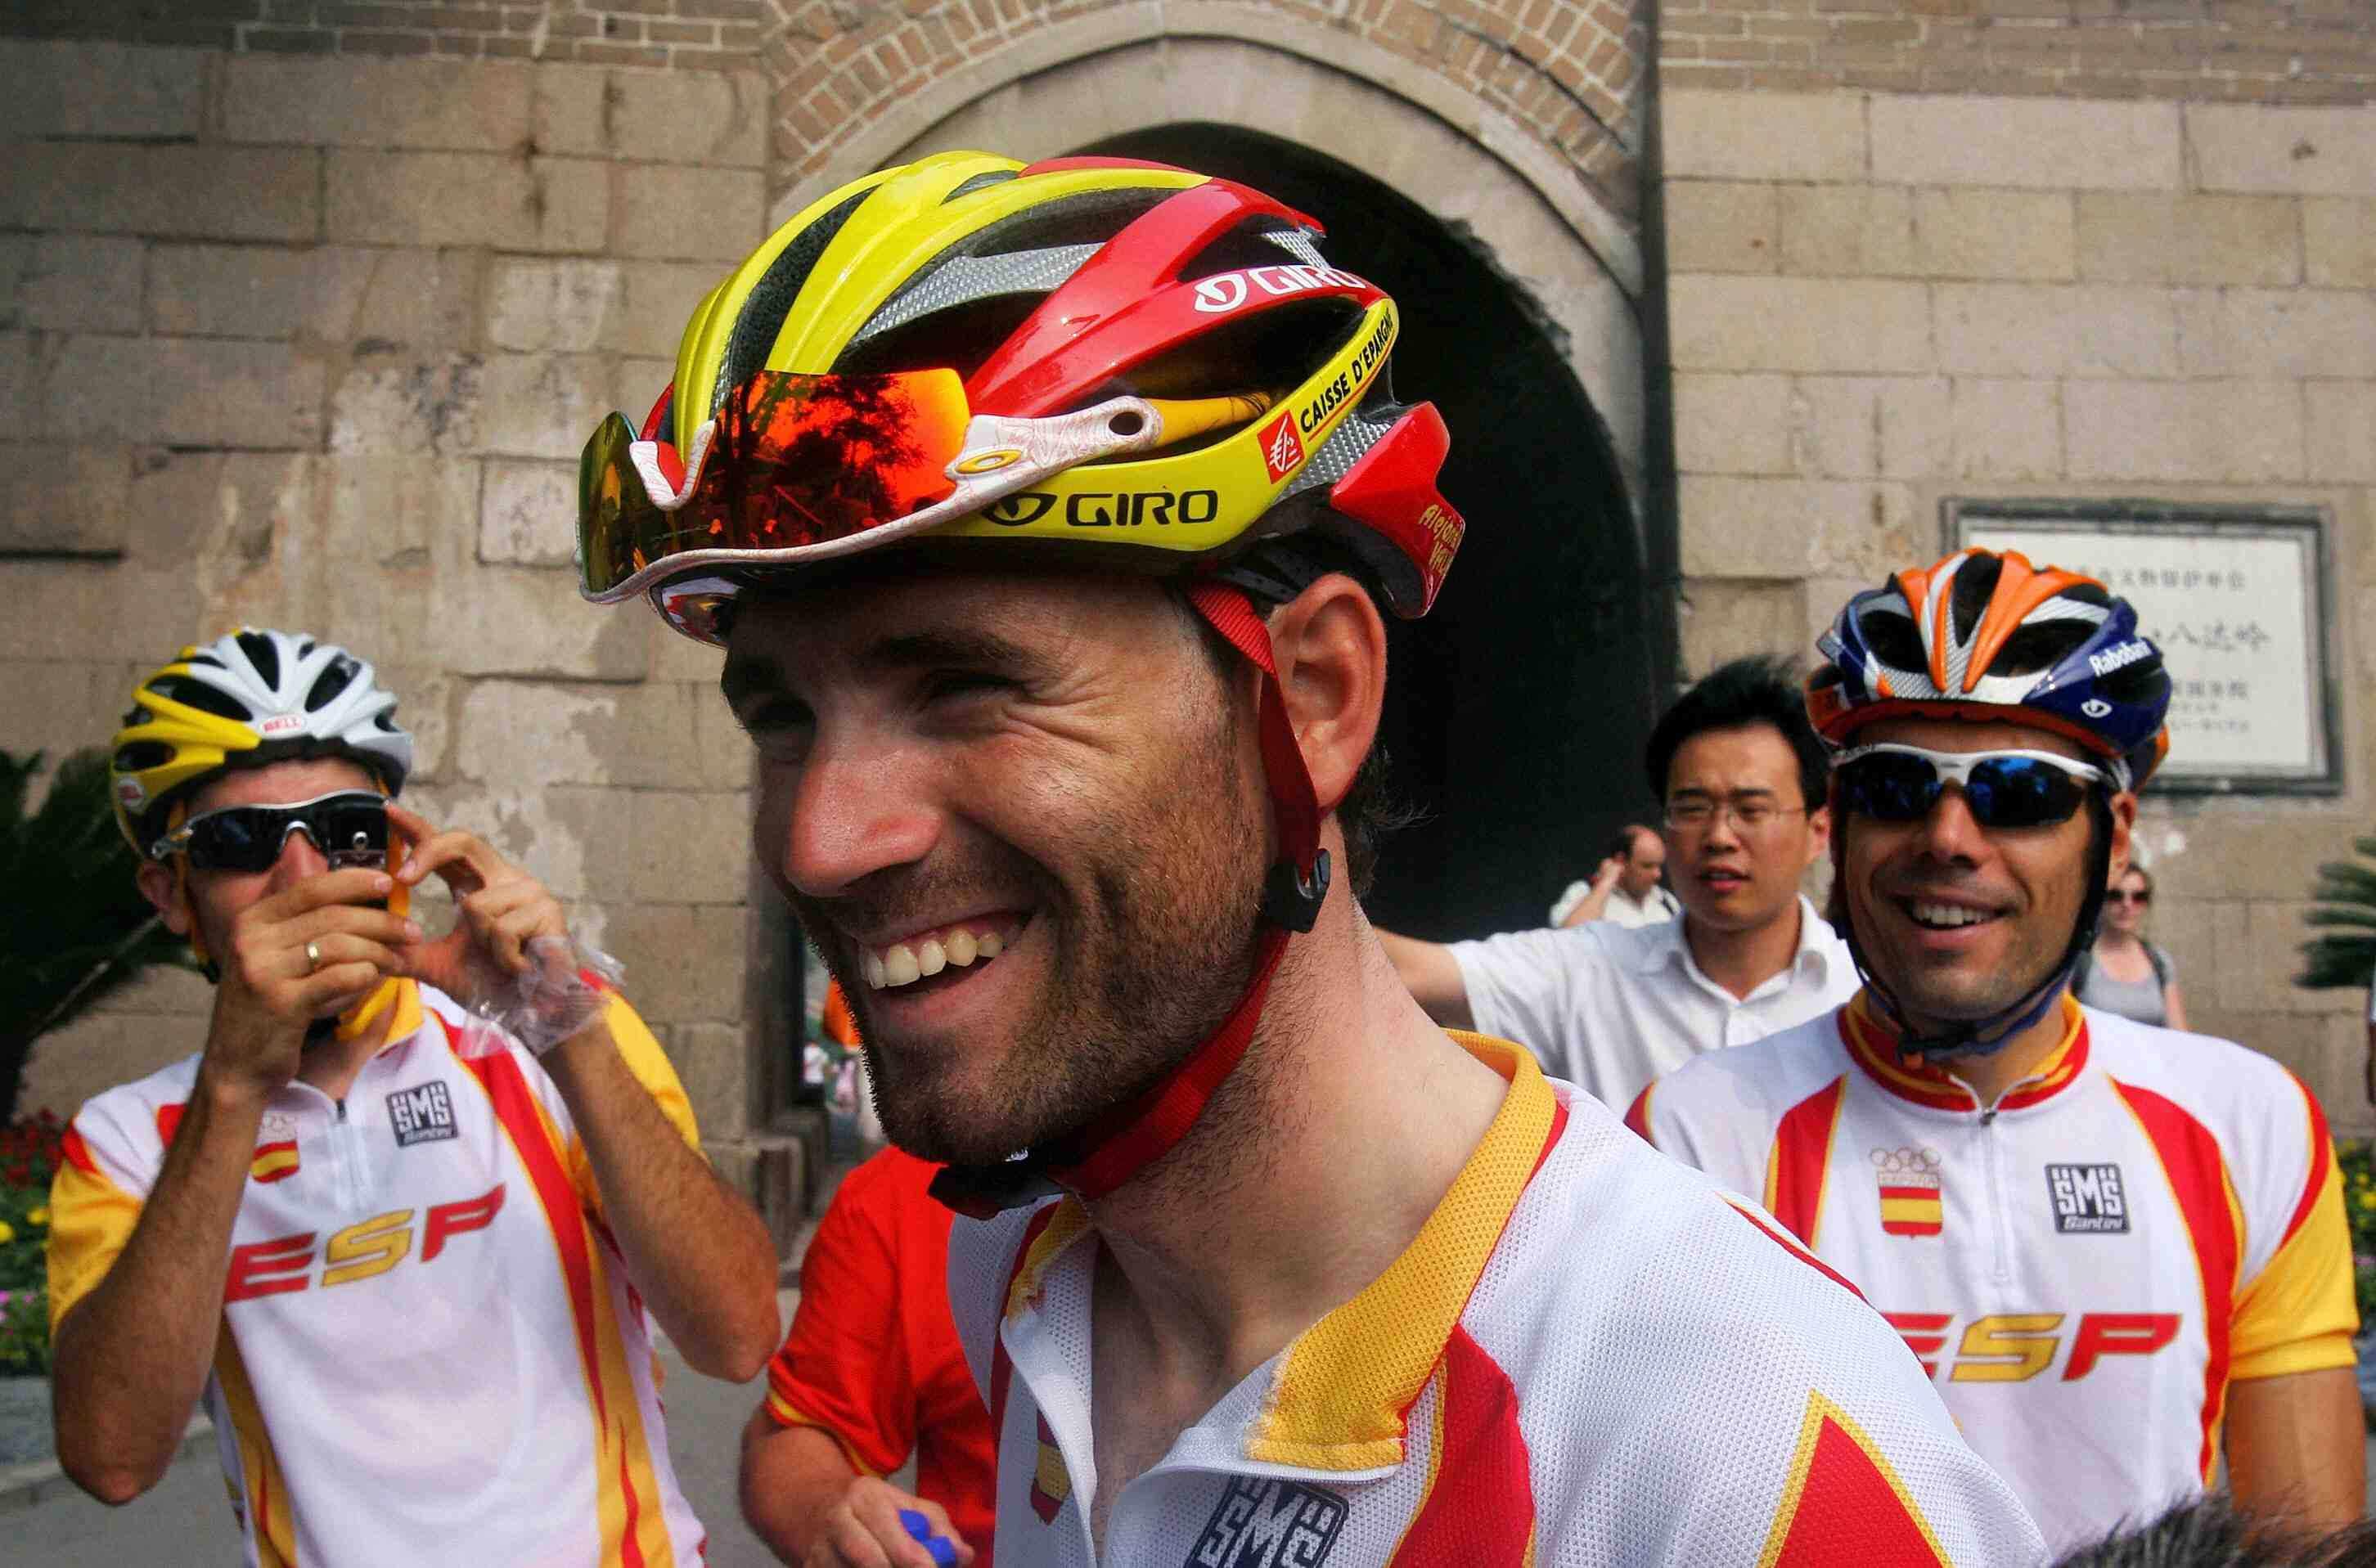 Samuel Sanchez, Alejandro Valverde (C) and Oscar Freire prepare to race for Spain Saturday in Beijing.